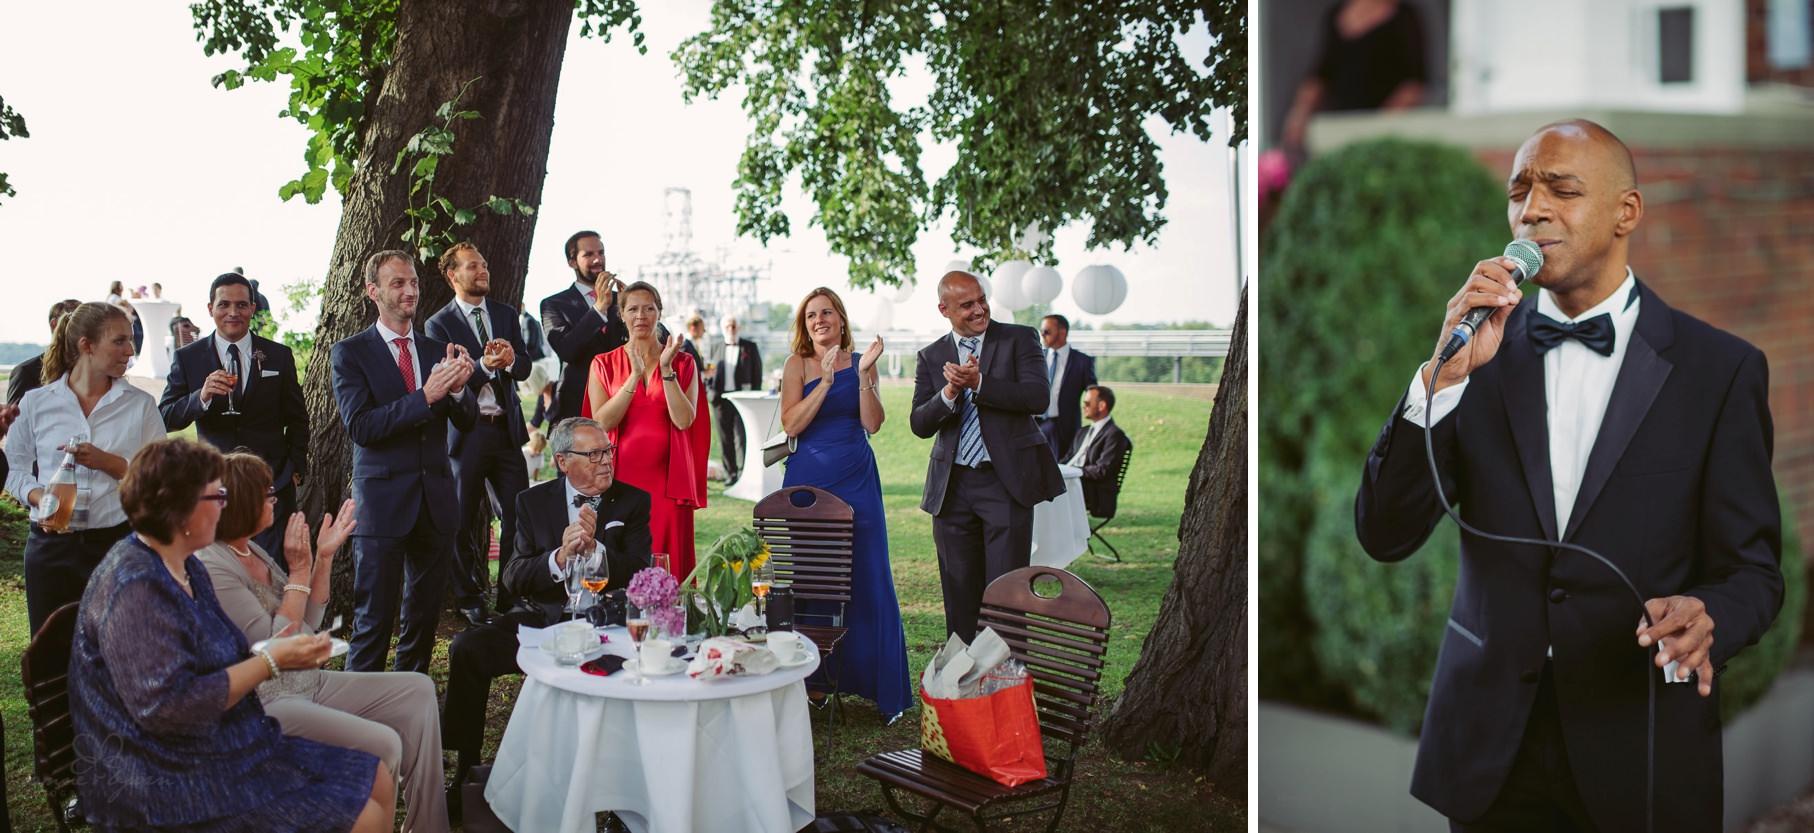 0070 aud blog d75 2643 - Hochzeit an der Hamburger Elbe - Ann-Katrin & Daniel